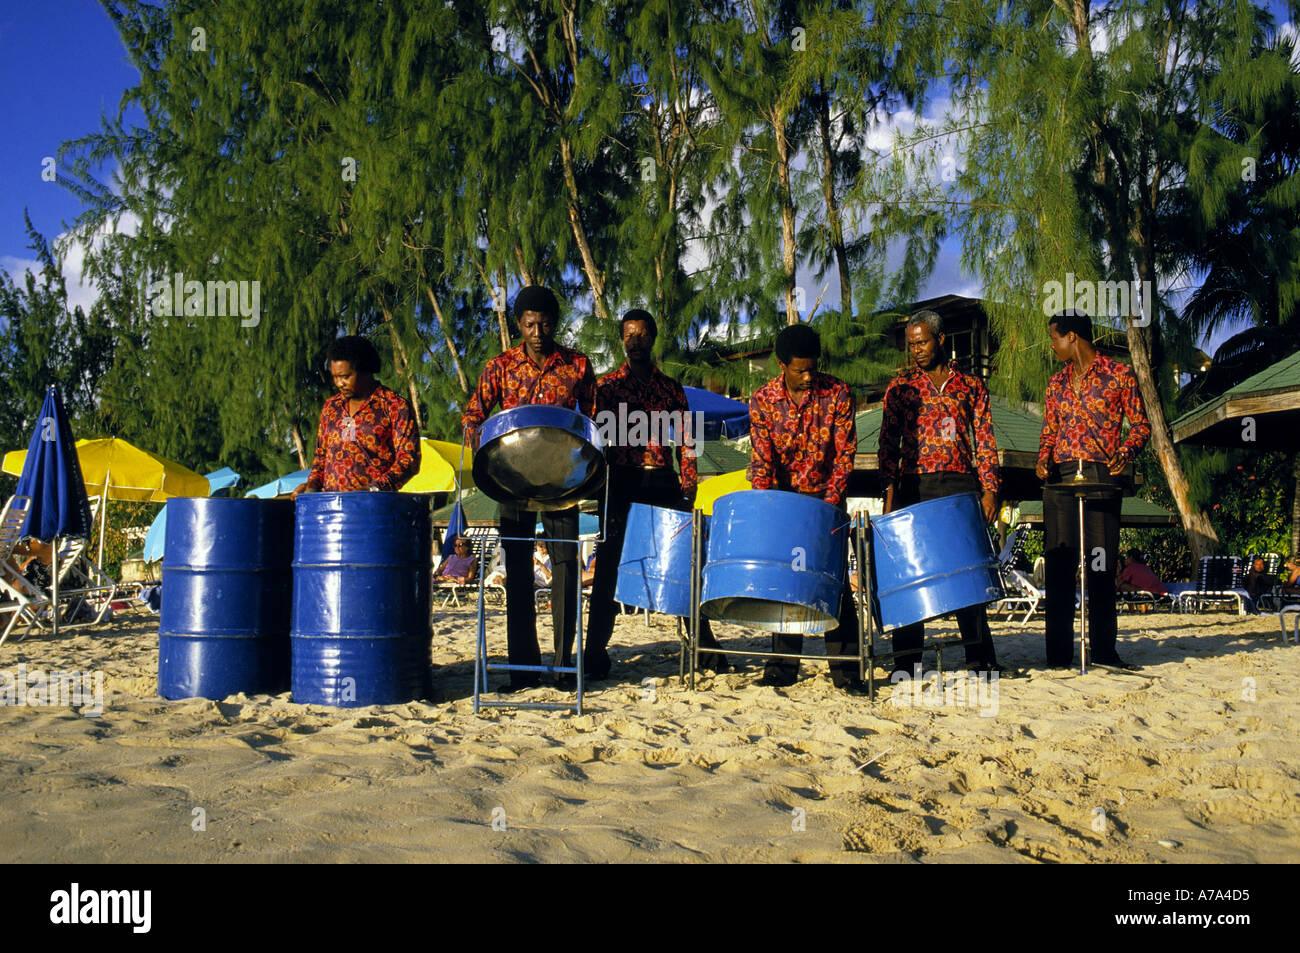 Steelband am Strand Insel Barbados Inselgruppe der kleinen Antillen Karibik Stockbild